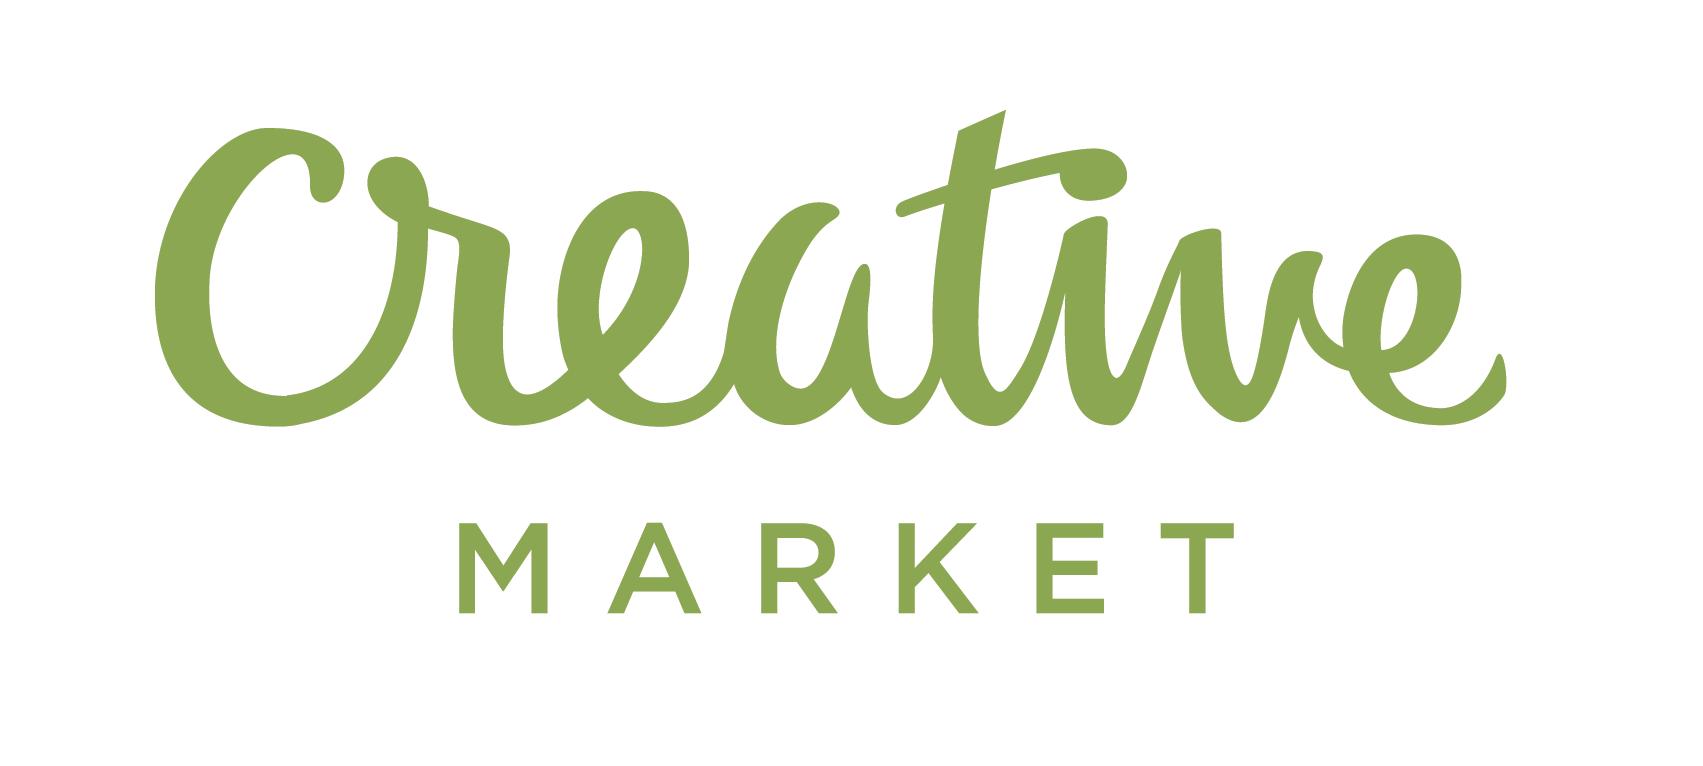 CreativeMarketLogo.png